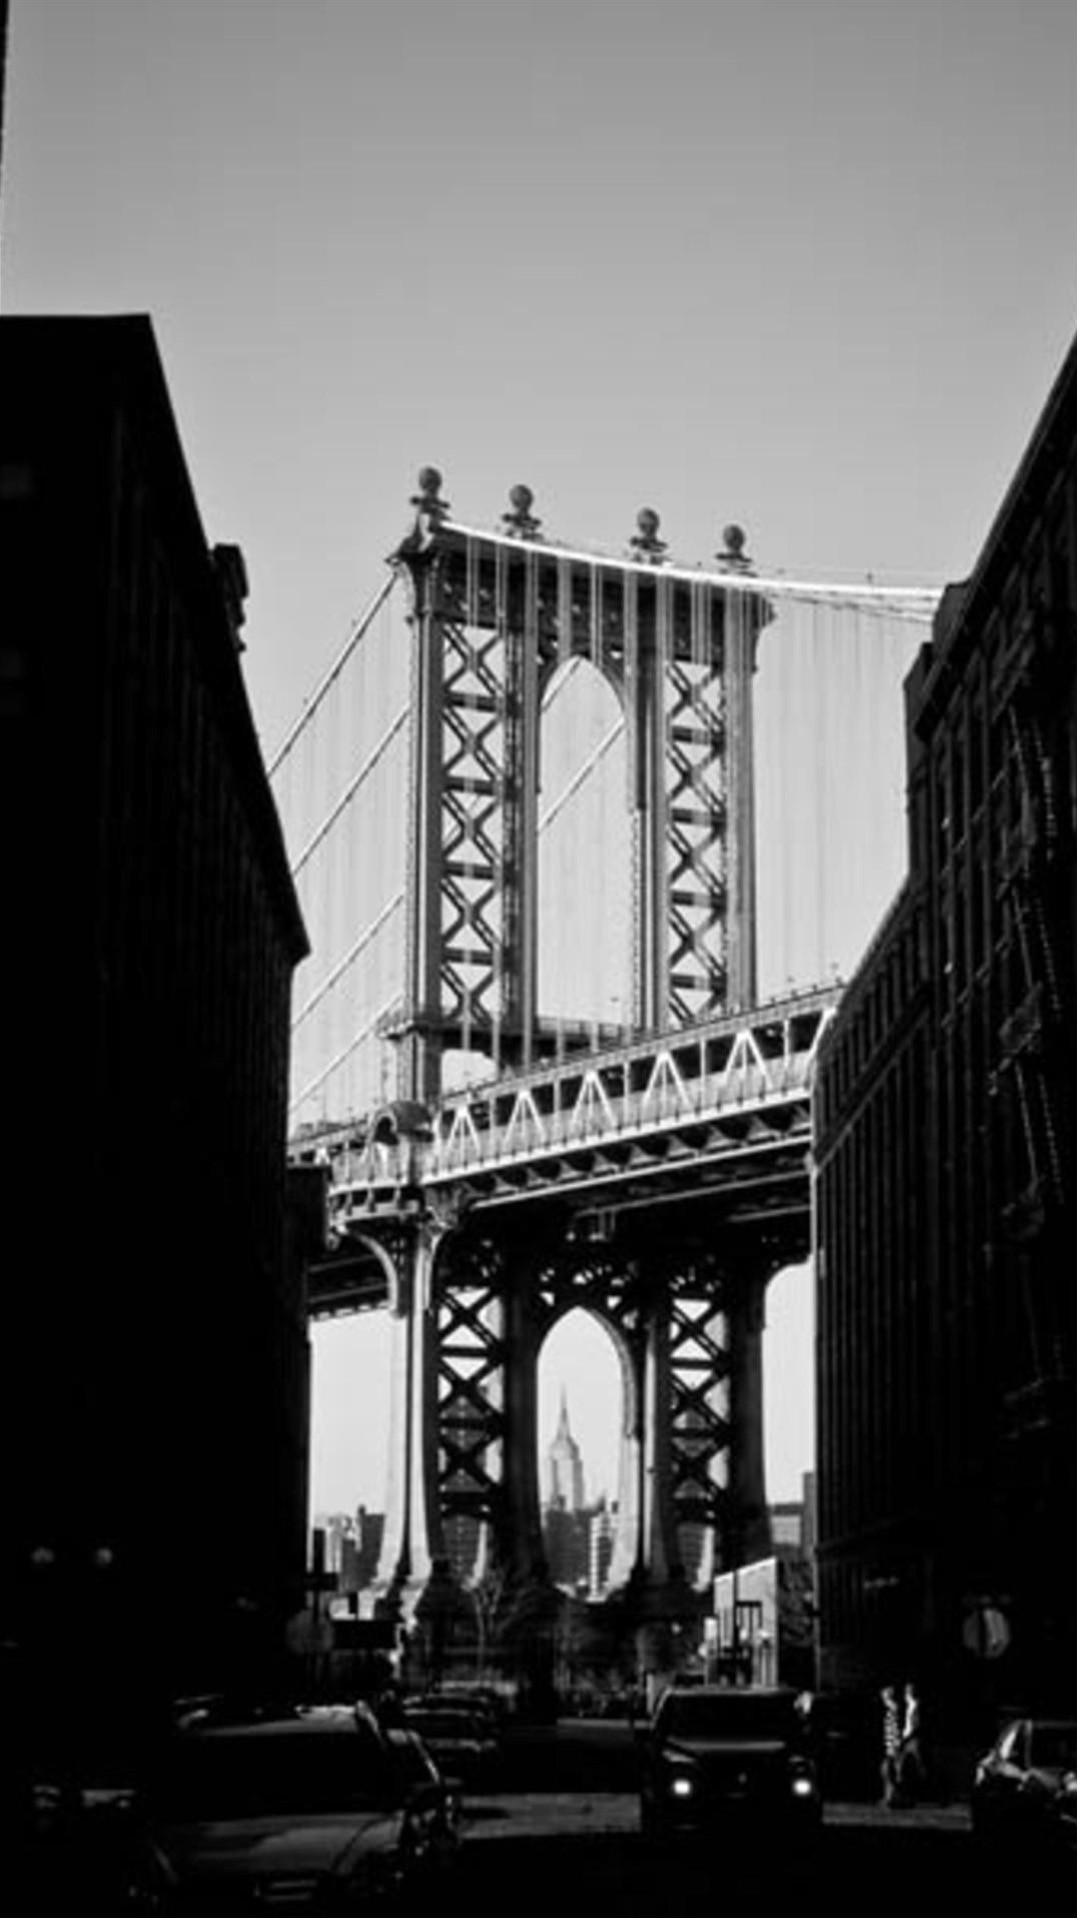 1080x1920 Manhattan Bridge New York Black And White Android Wallpaper